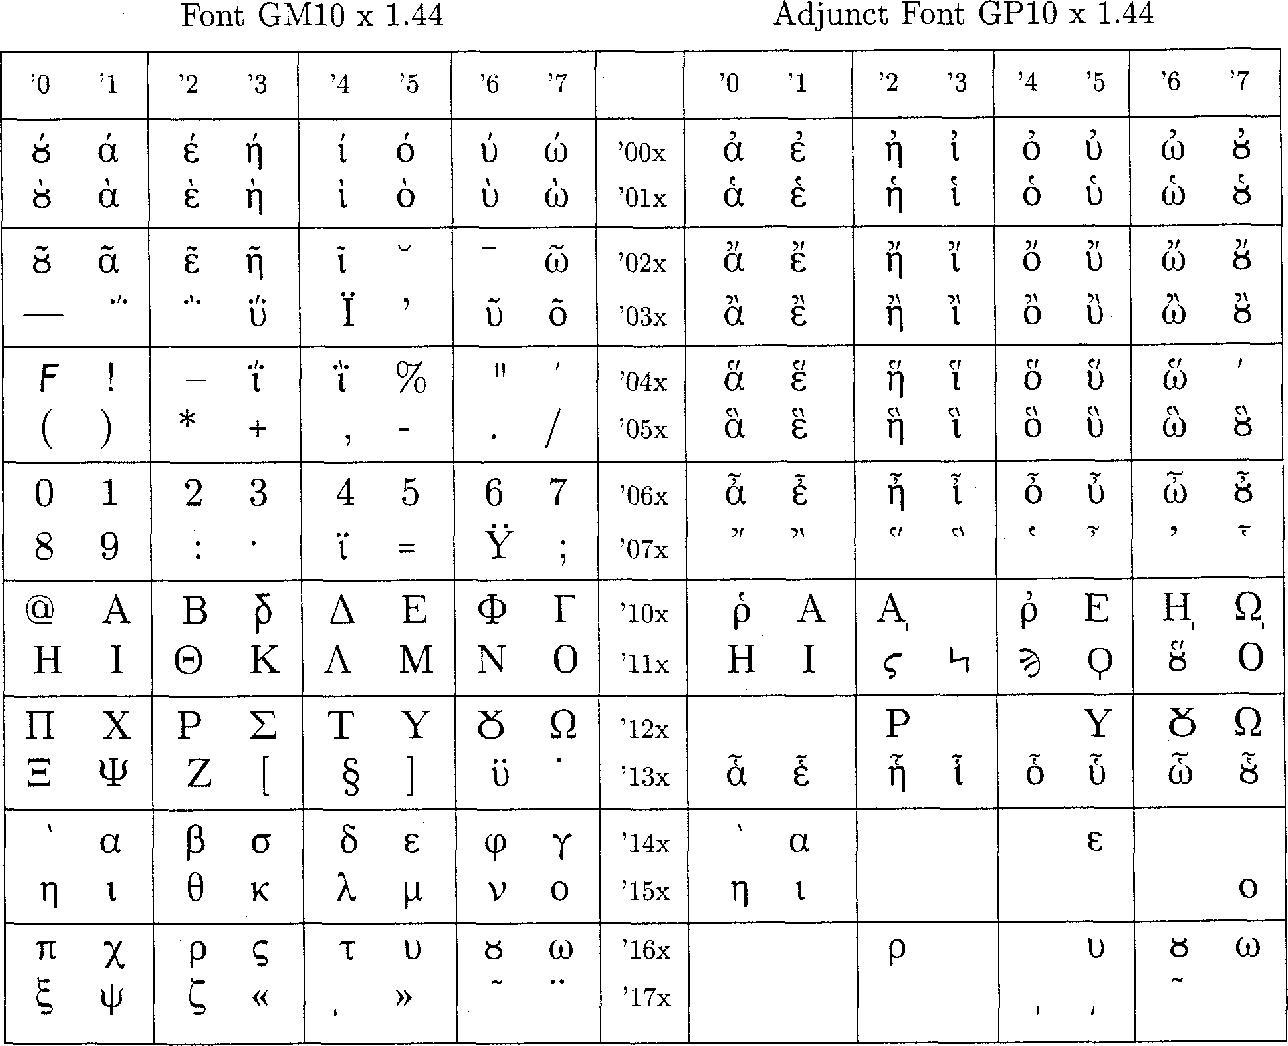 PDF] Comple te Greek wi th Adjunct Fonts - Semantic Scholar